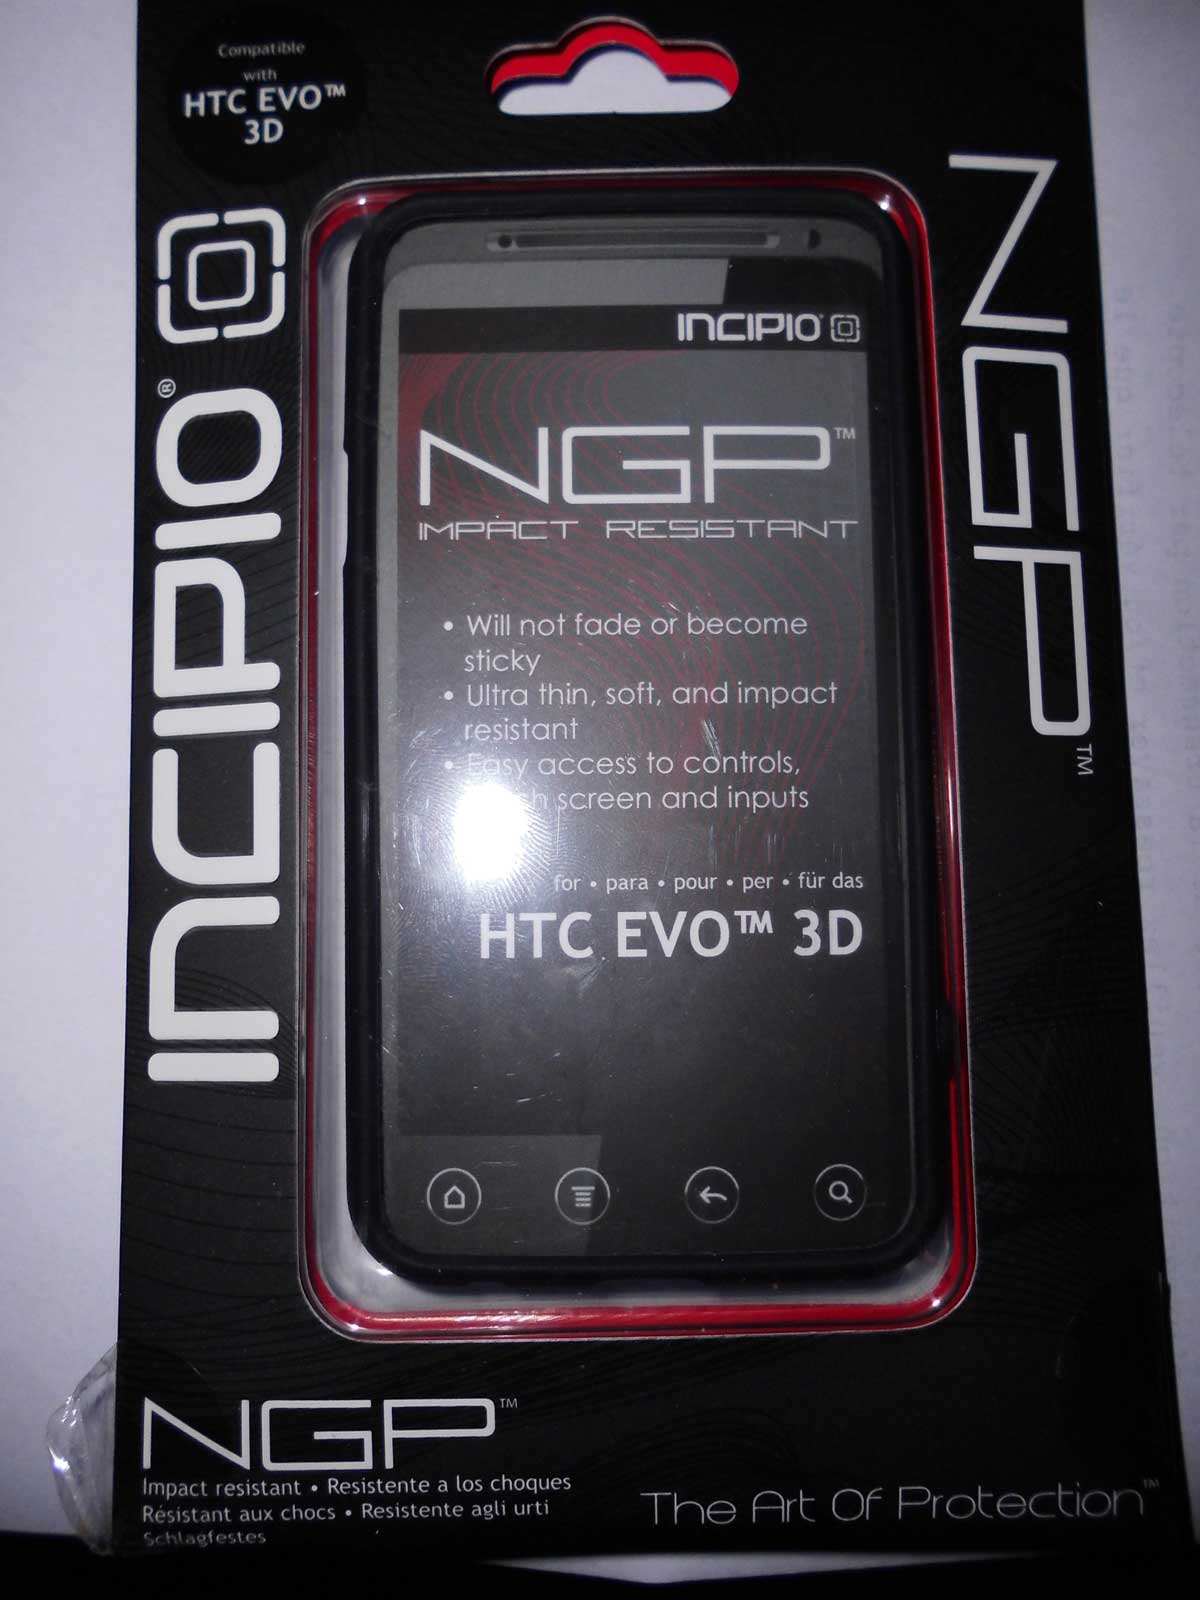 protection-htc-evo-3D-incipio-ngp